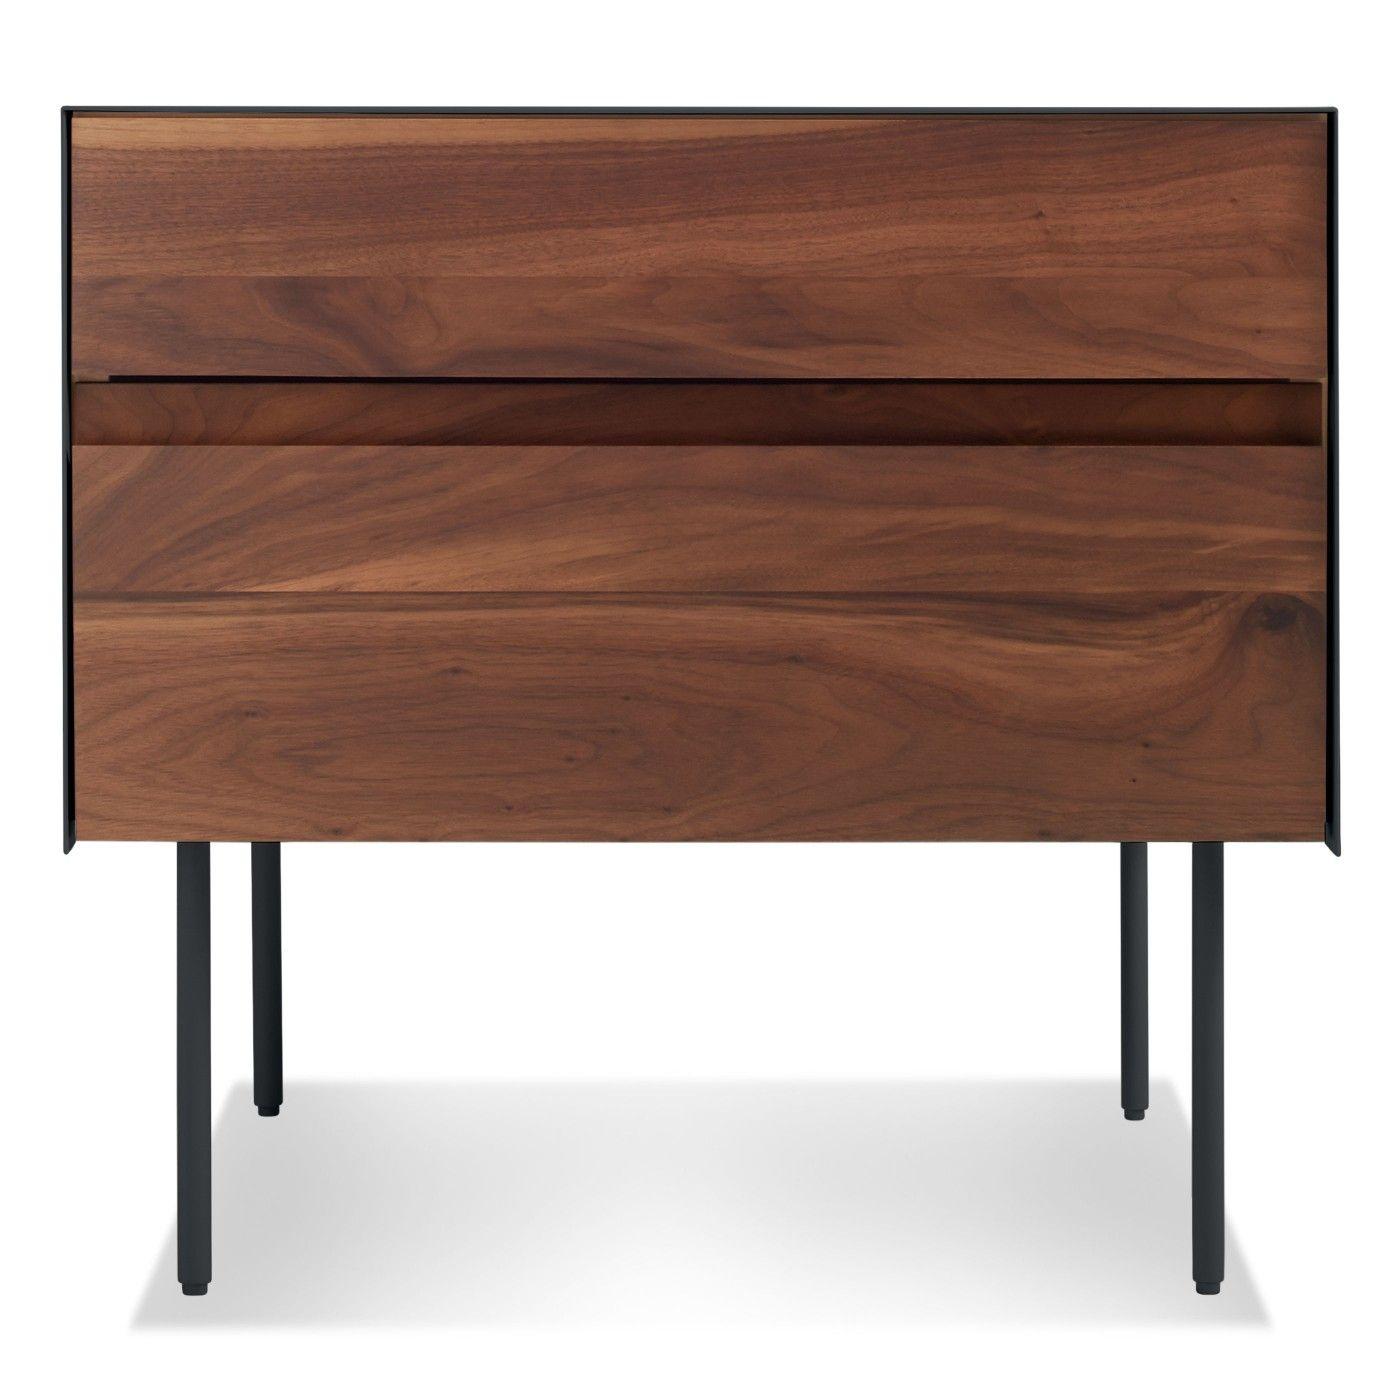 Clad Nightstand Modern bedside table, Modern bedroom